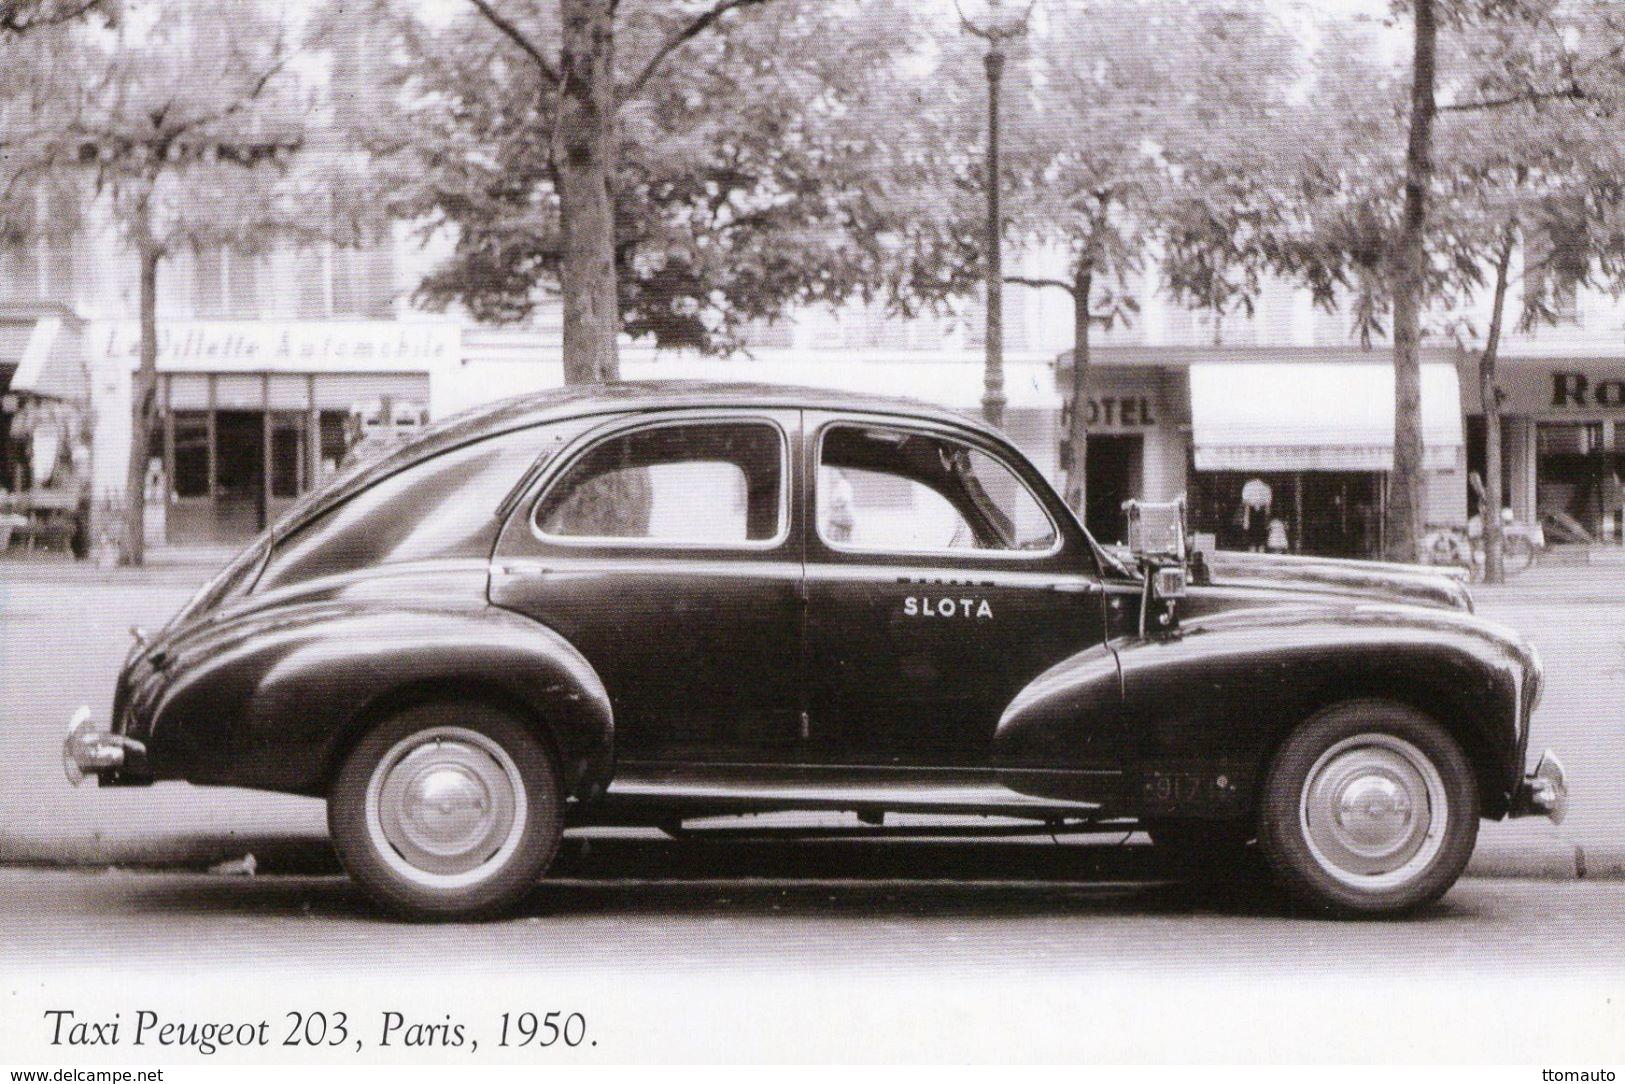 Taxi  -  Peugeot 203  -  SLOTA  -  Paris  -  1950  -  CPM - Taxis & Cabs